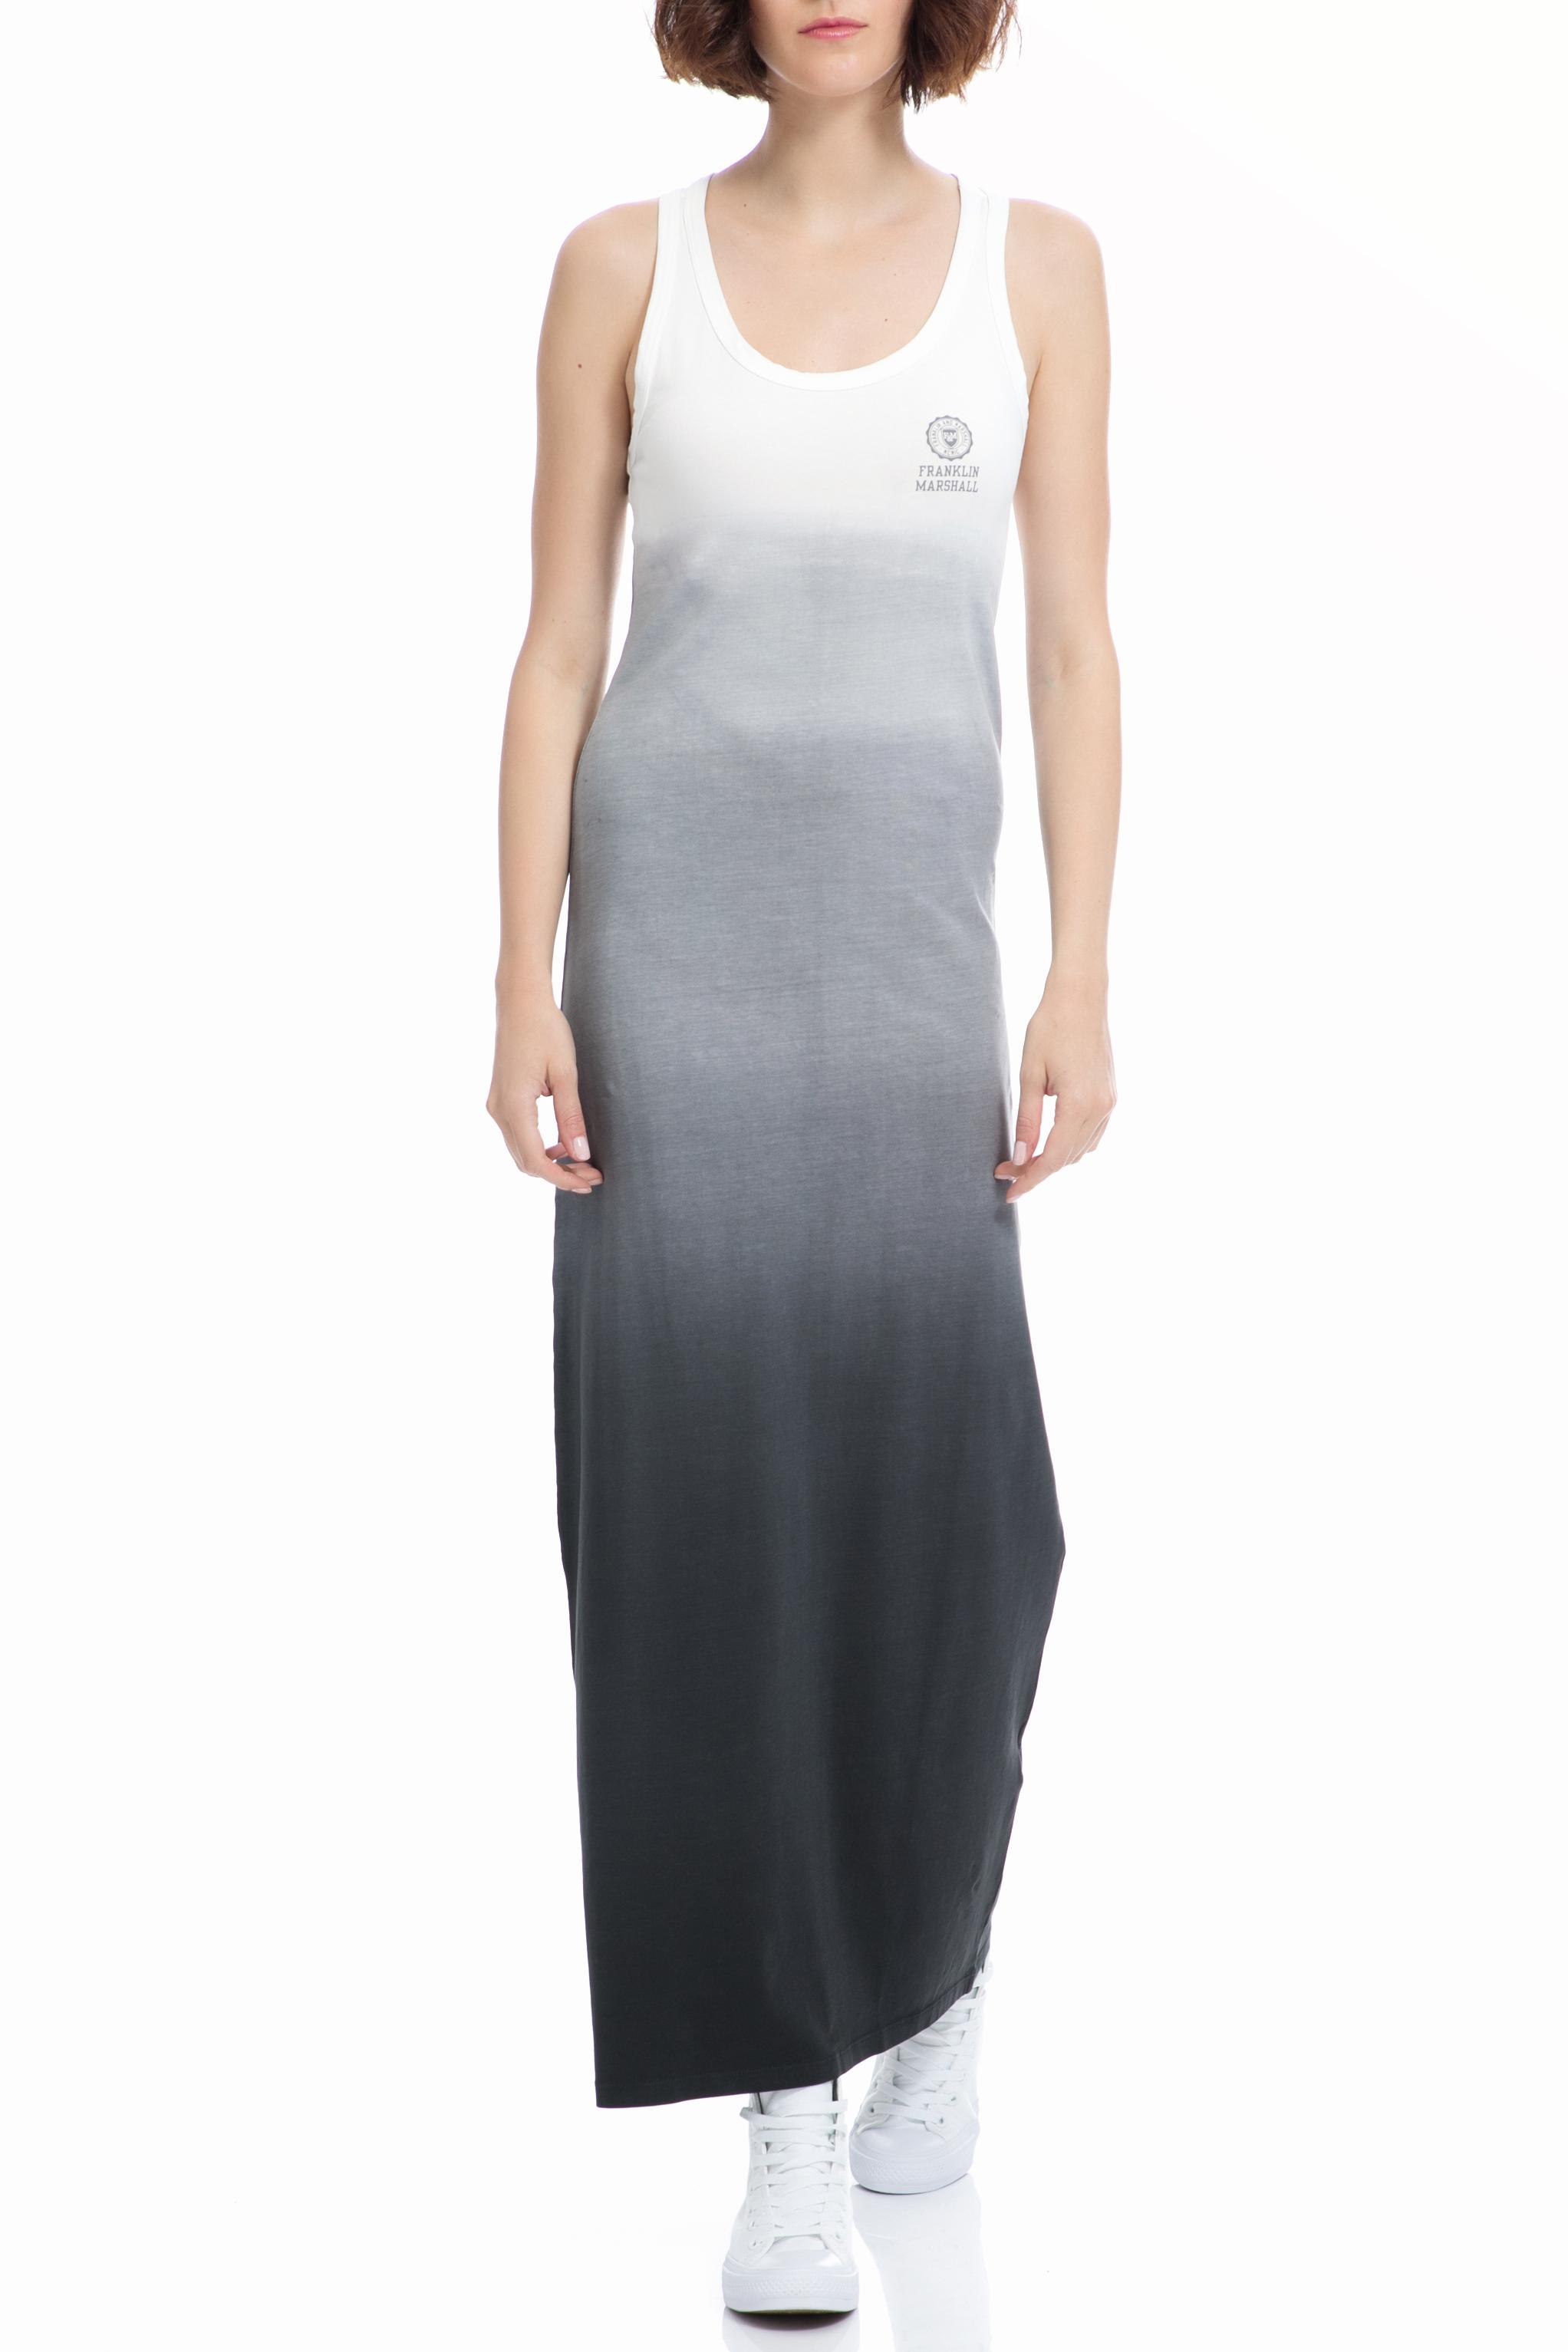 FRANKLIN & MARSHALL - Γυναικείο φόρεμα Franklin & Marshall λευκό-γκρι